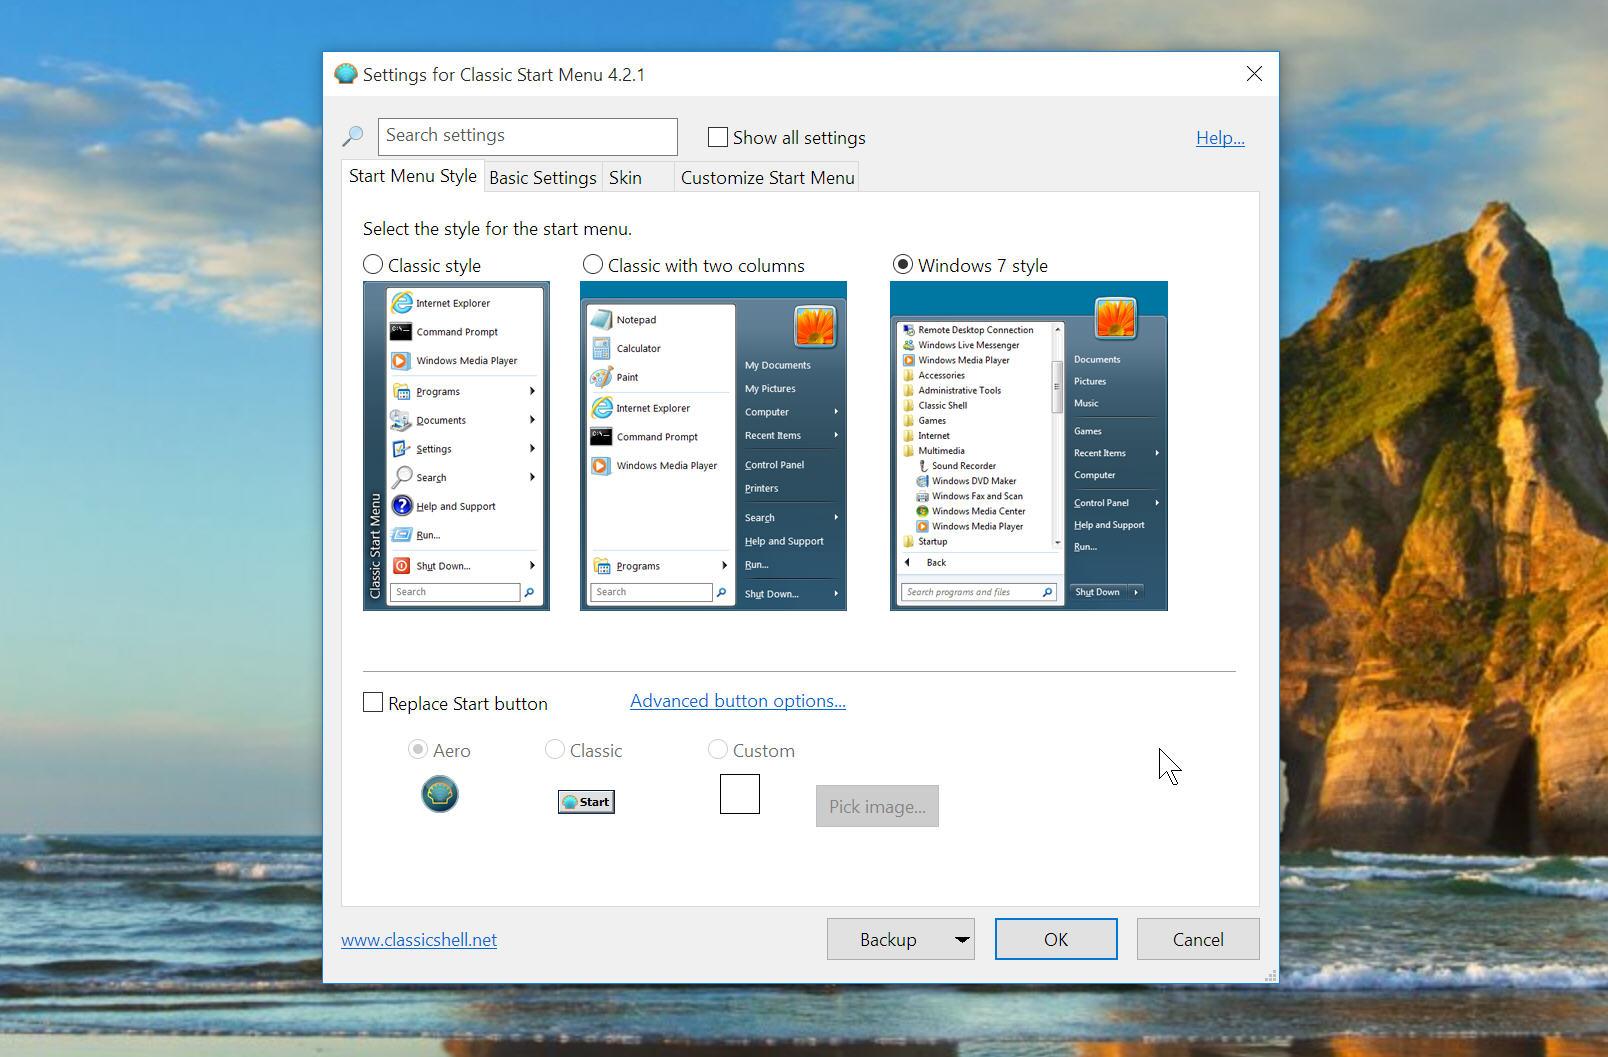 The Best Alternative Start Menus For Windows 10